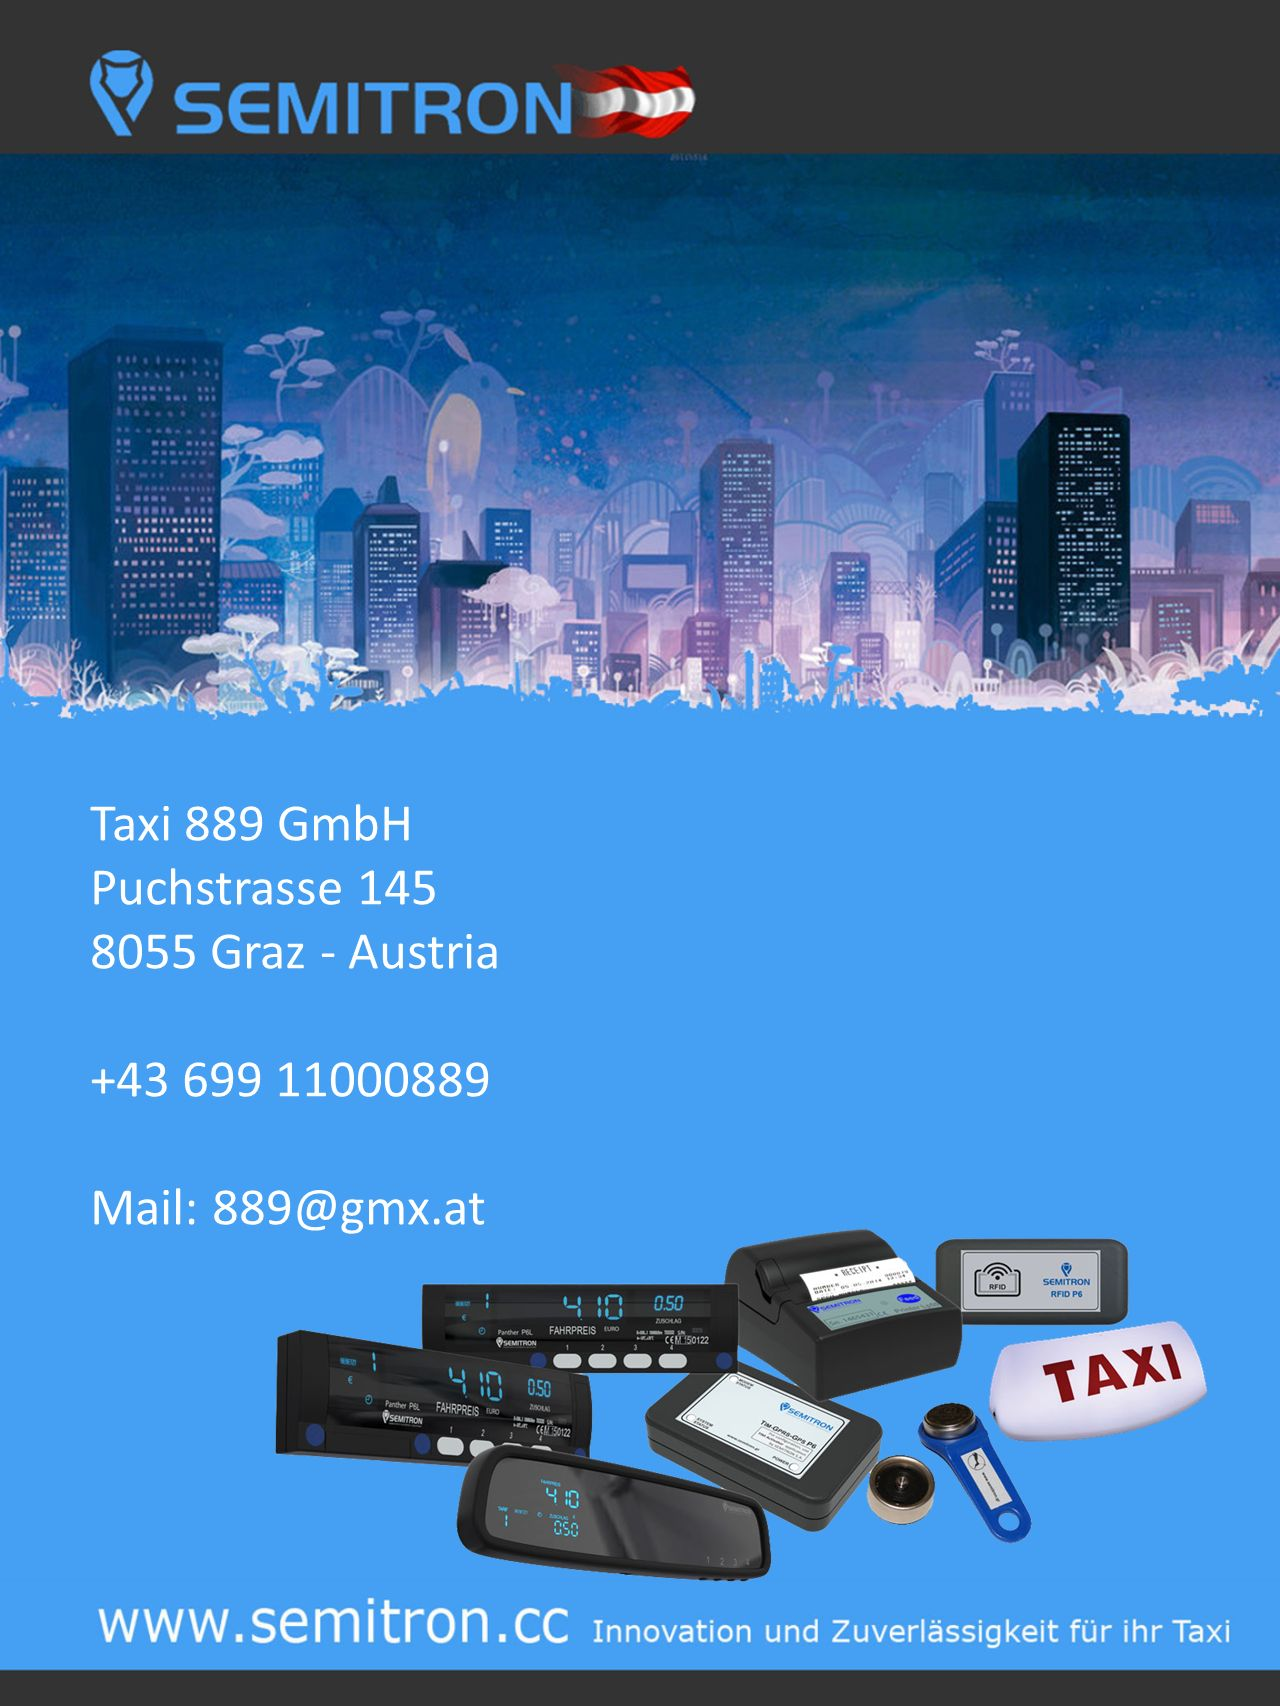 Taxi 889 GmbH Puchstrasse 145 8055 Graz - Austria +43 699 11000889 Mail: 889@gmx.at